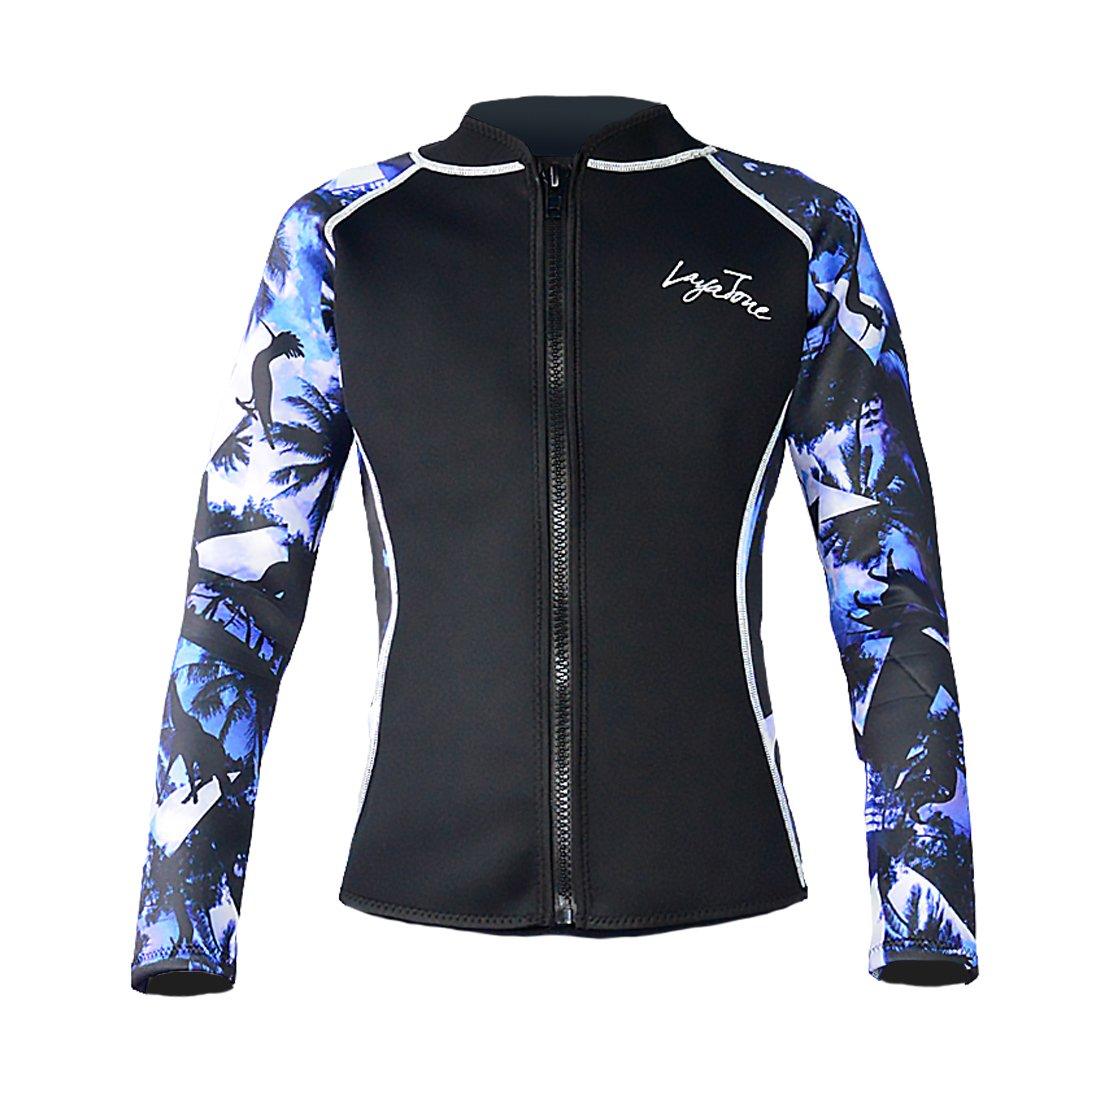 Layatone Wetsuit Top Men Women 3mm Neoprene Suit Scuba Diving Surfing Jacket Rash Guard Wet Suits Top Jacket Women Men Adults Long Sleeves Front YKK Zipper Wetsuits Jacket (Blue-Lycra Sleeve)